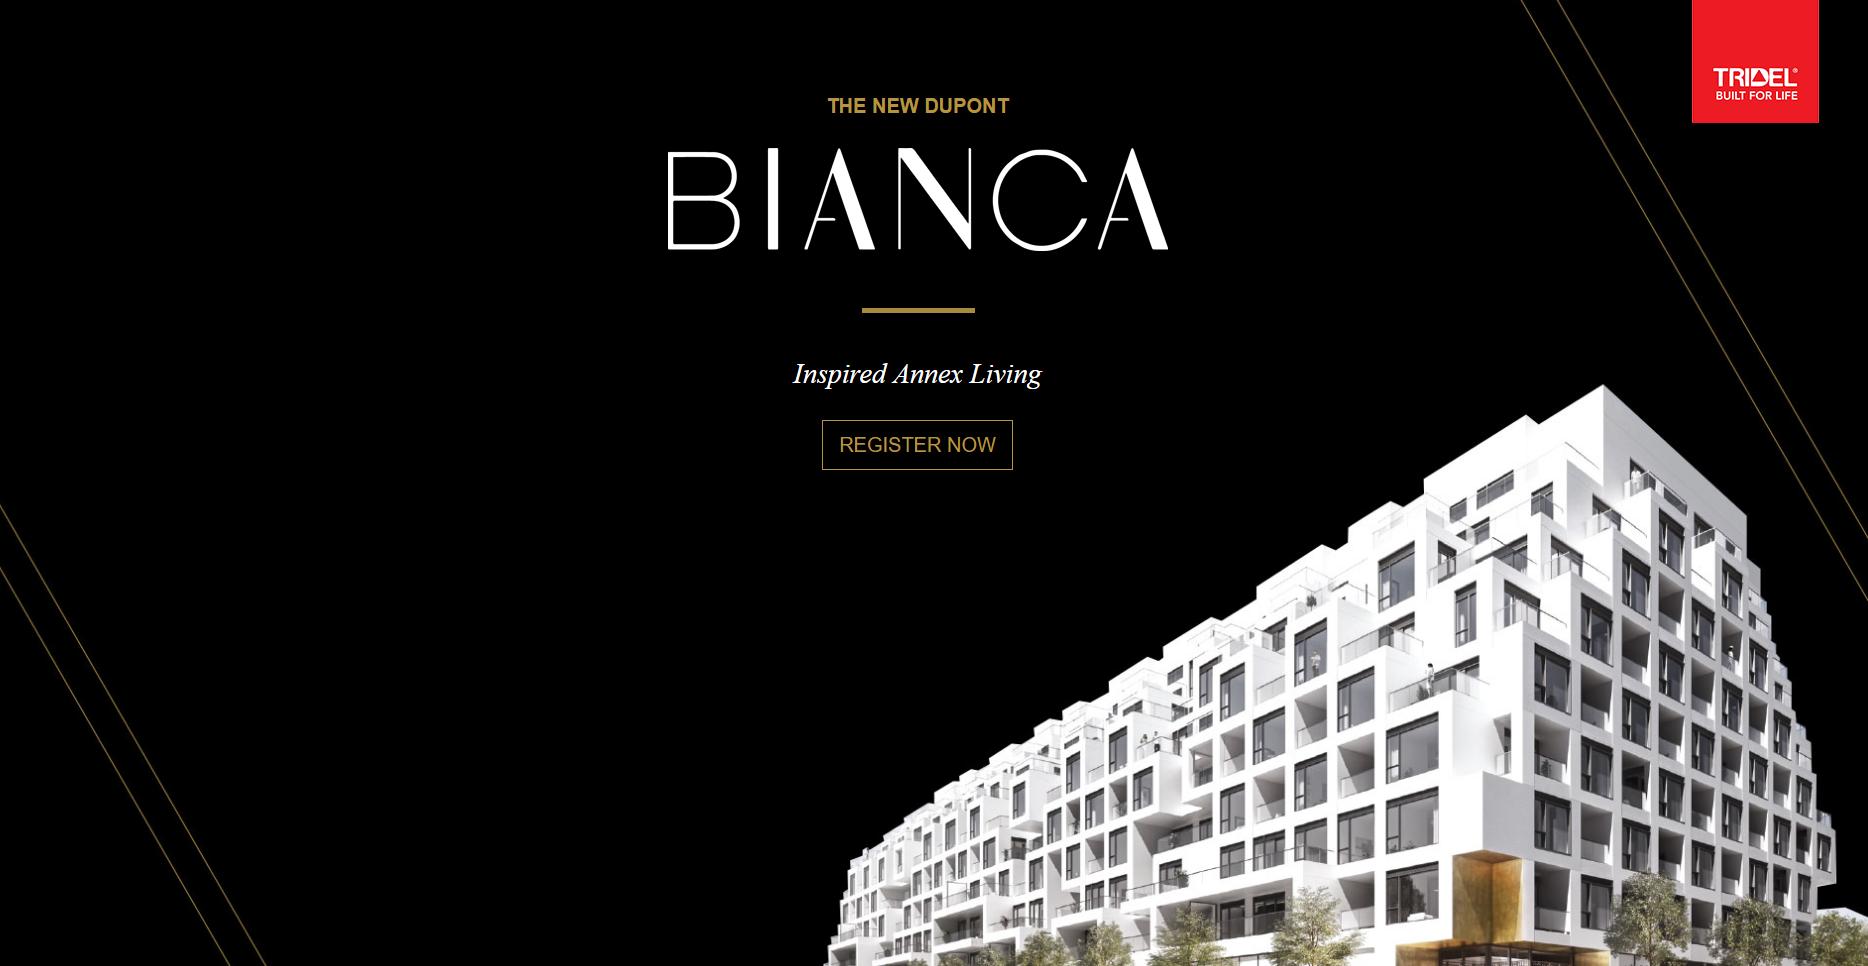 THE NEW DUPONT BIANCA CONDOMINIUMS